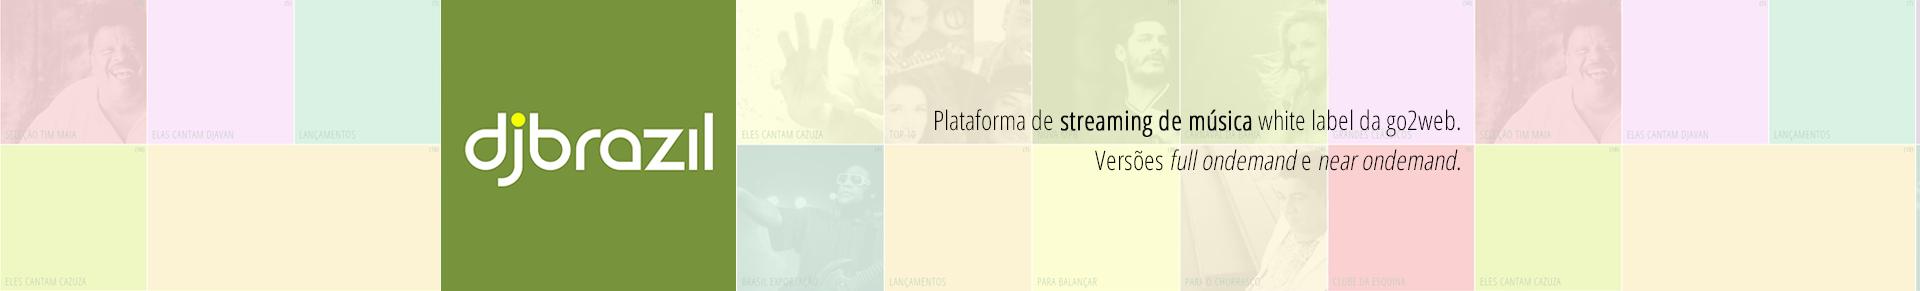 djbrazil - Plataforma white label de streaming de música brasileira.